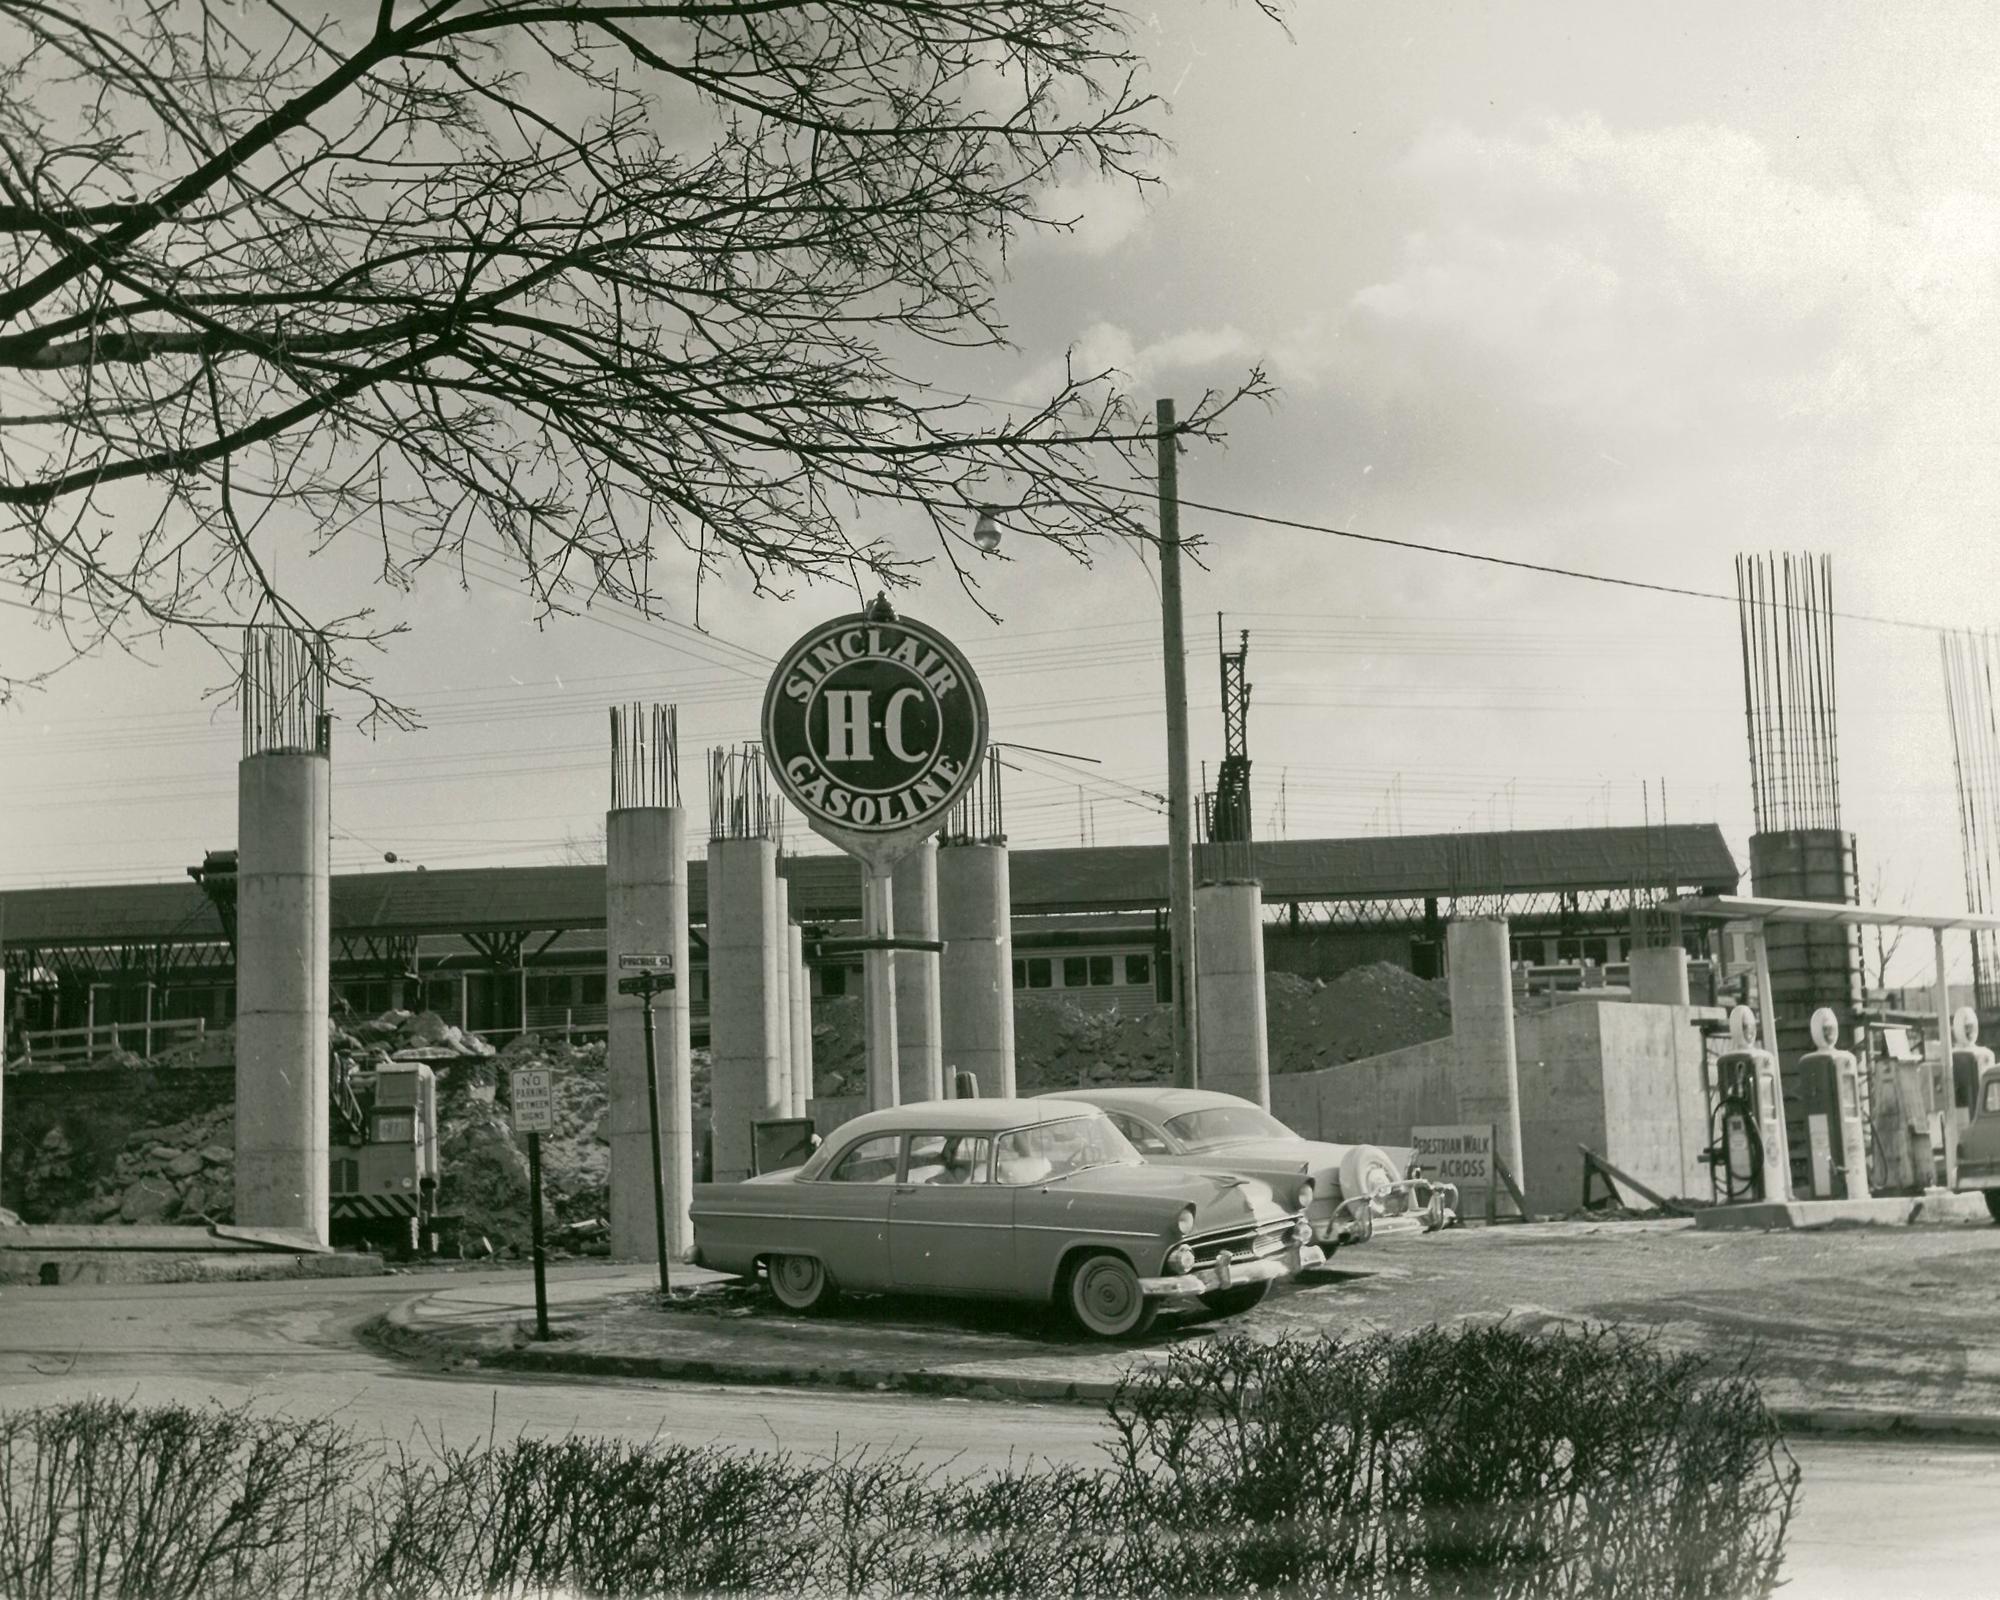 Building I-95 c 1950s